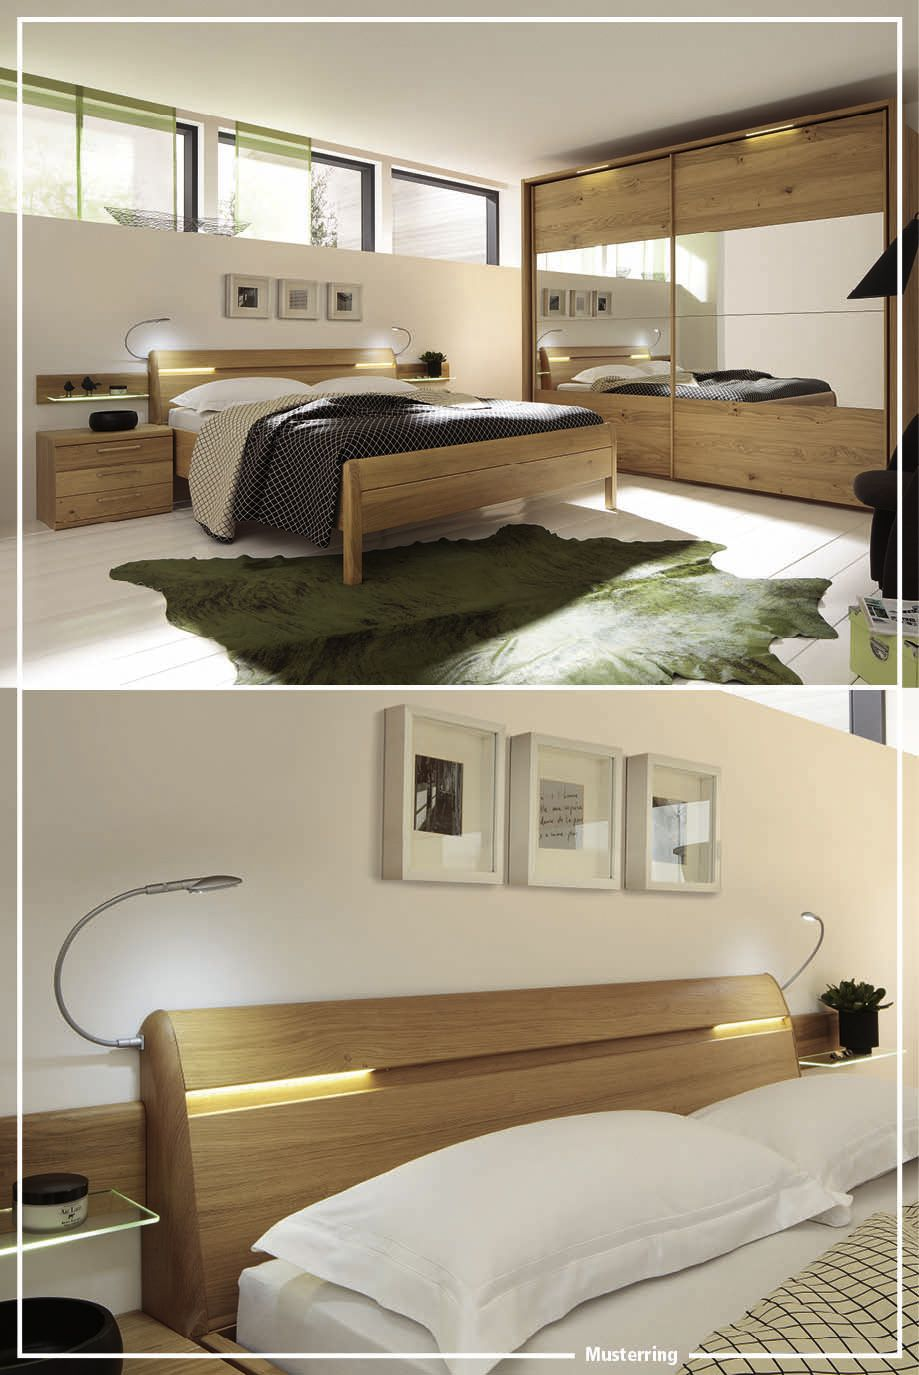 Musterring MANERA Schlafzimmer | sleeping room | Schlafzimmer ...